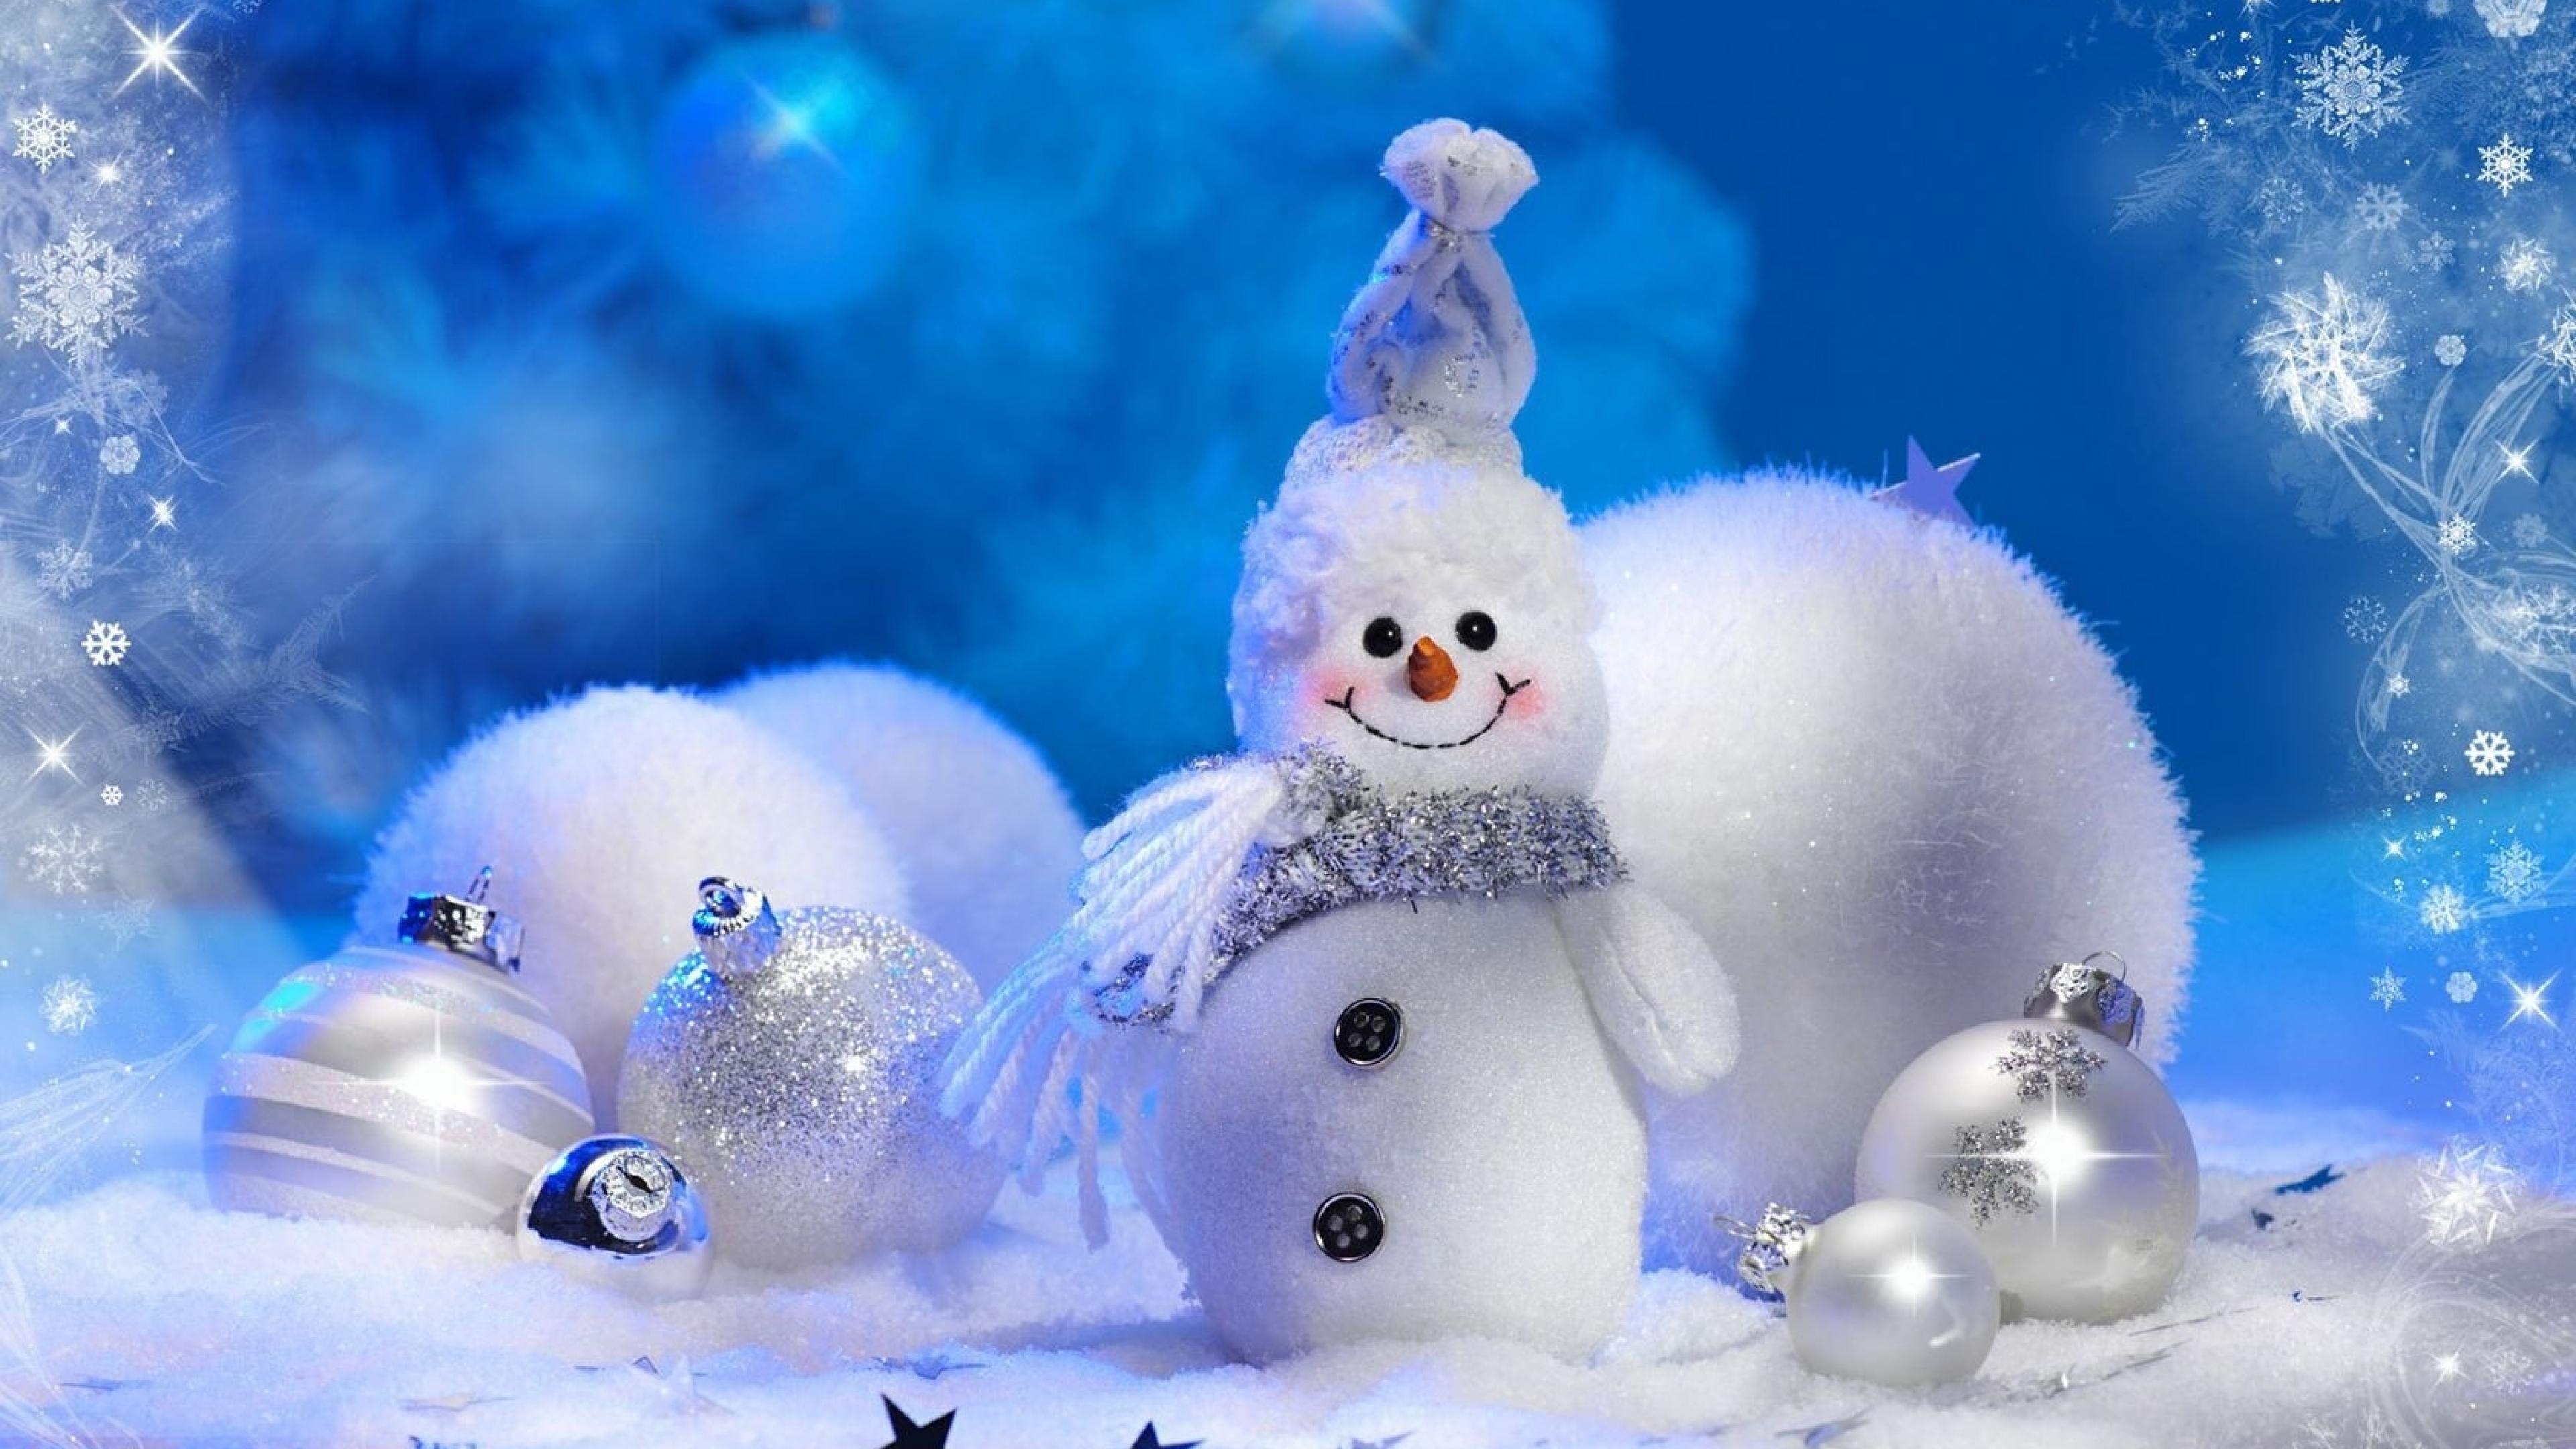 Holidays Celebrations 14 High Definition Wallpaper Snowman Christmas Decorations Christmas Wallpaper Christmas Snowman